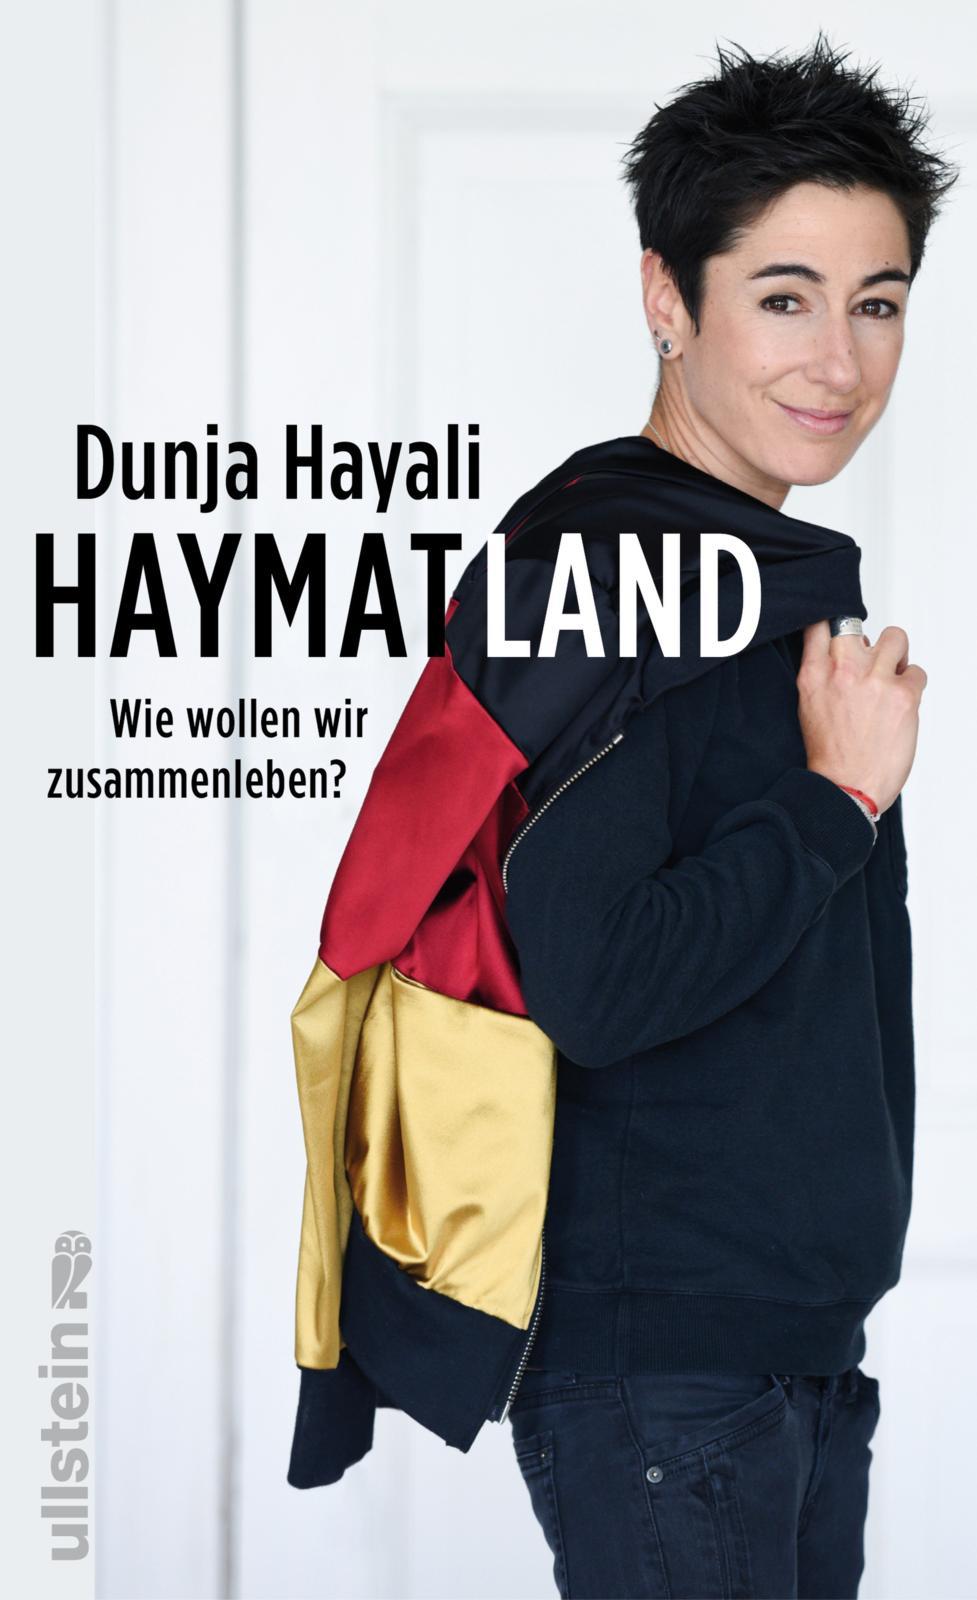 cover_dunja_hayali_haymatland.jpg